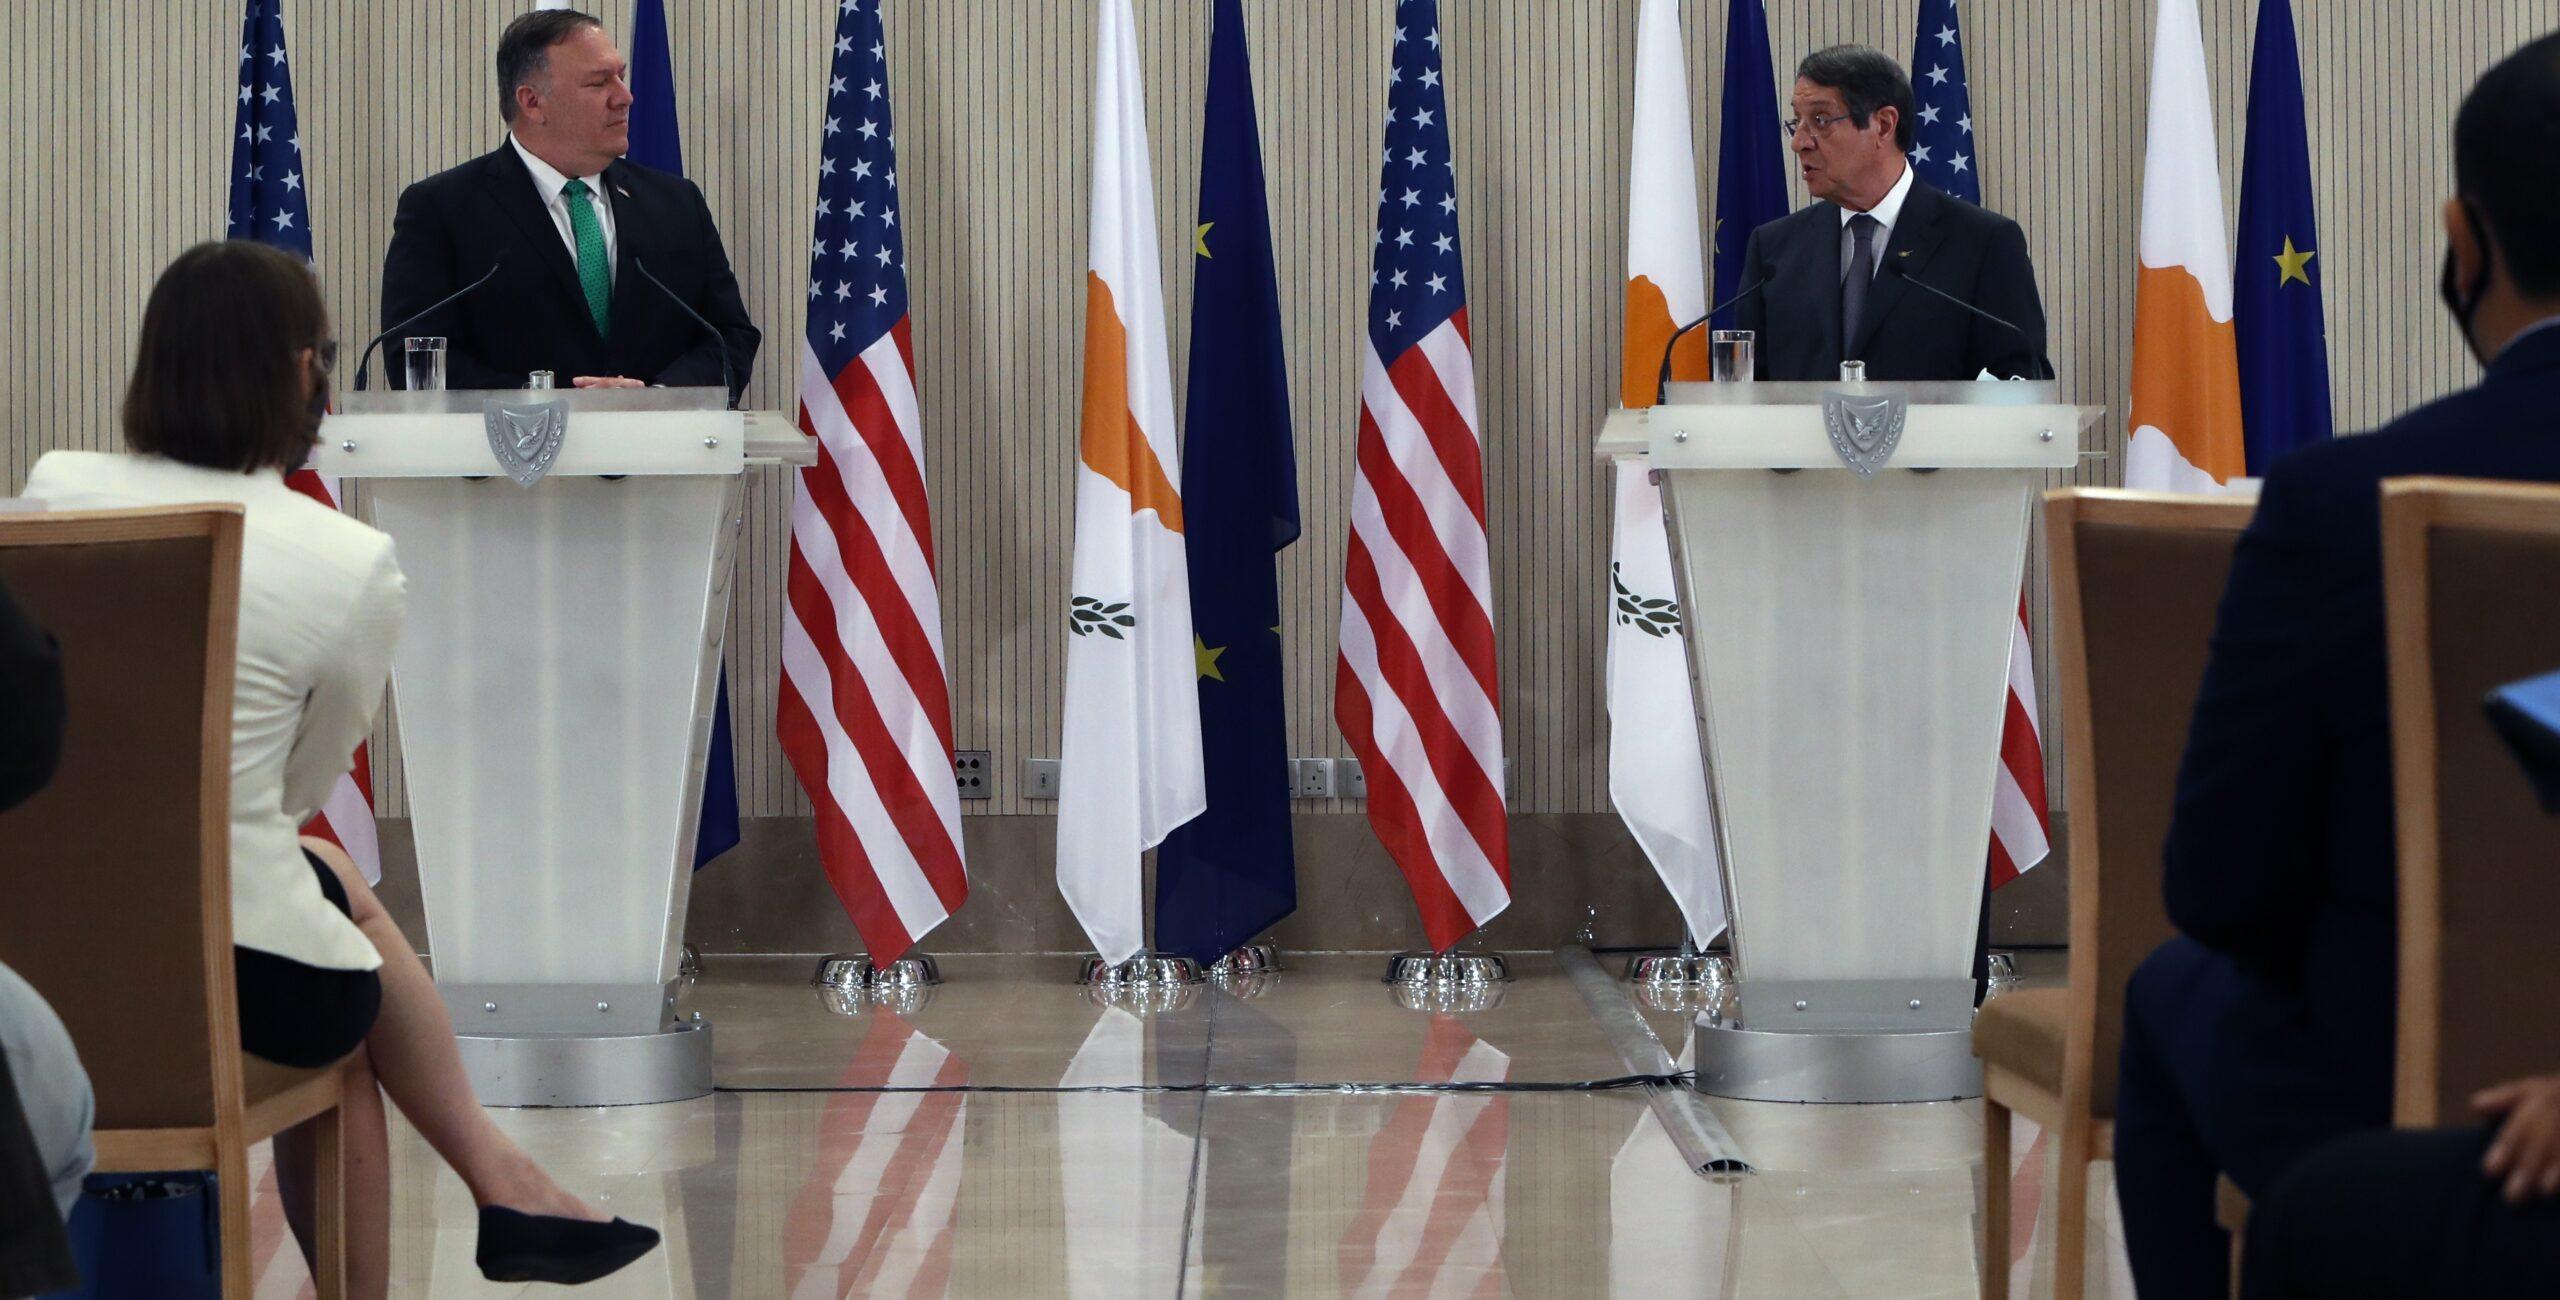 U.S. Secretary of State Michael R. Pompeo and Cypriot President Nicos Anastasiades at podiums.